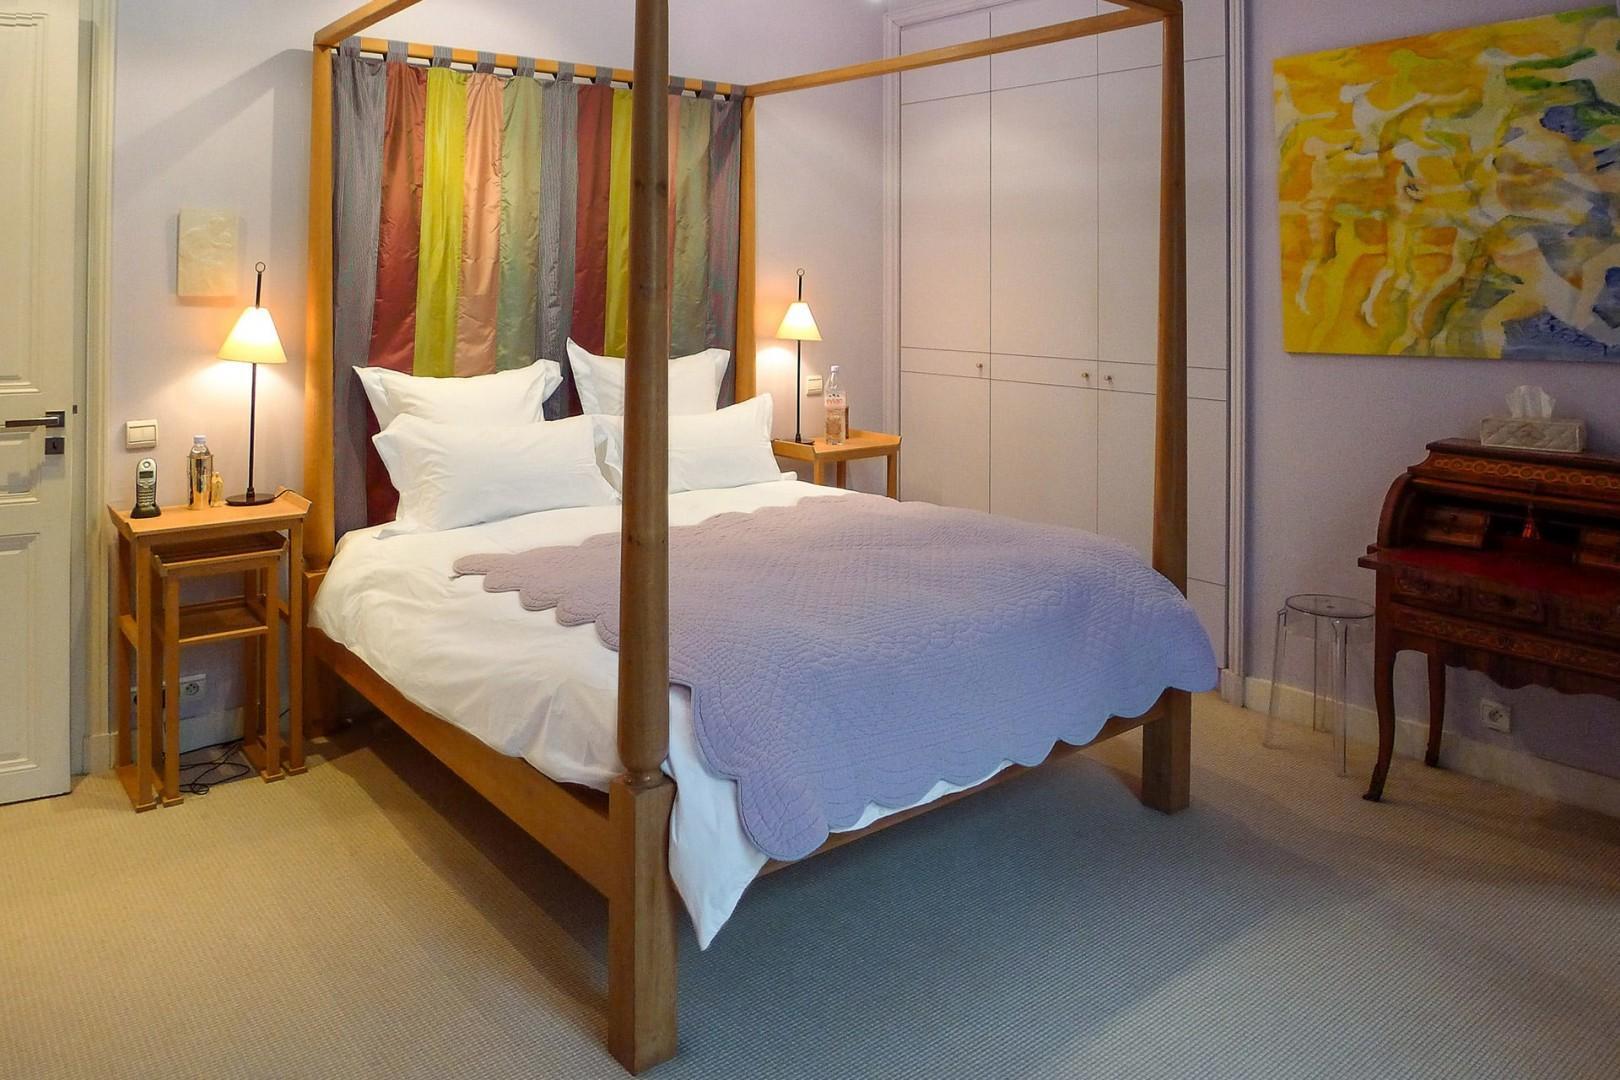 Bedroom 2 comes with a comfortable bed and en suite bathroom.